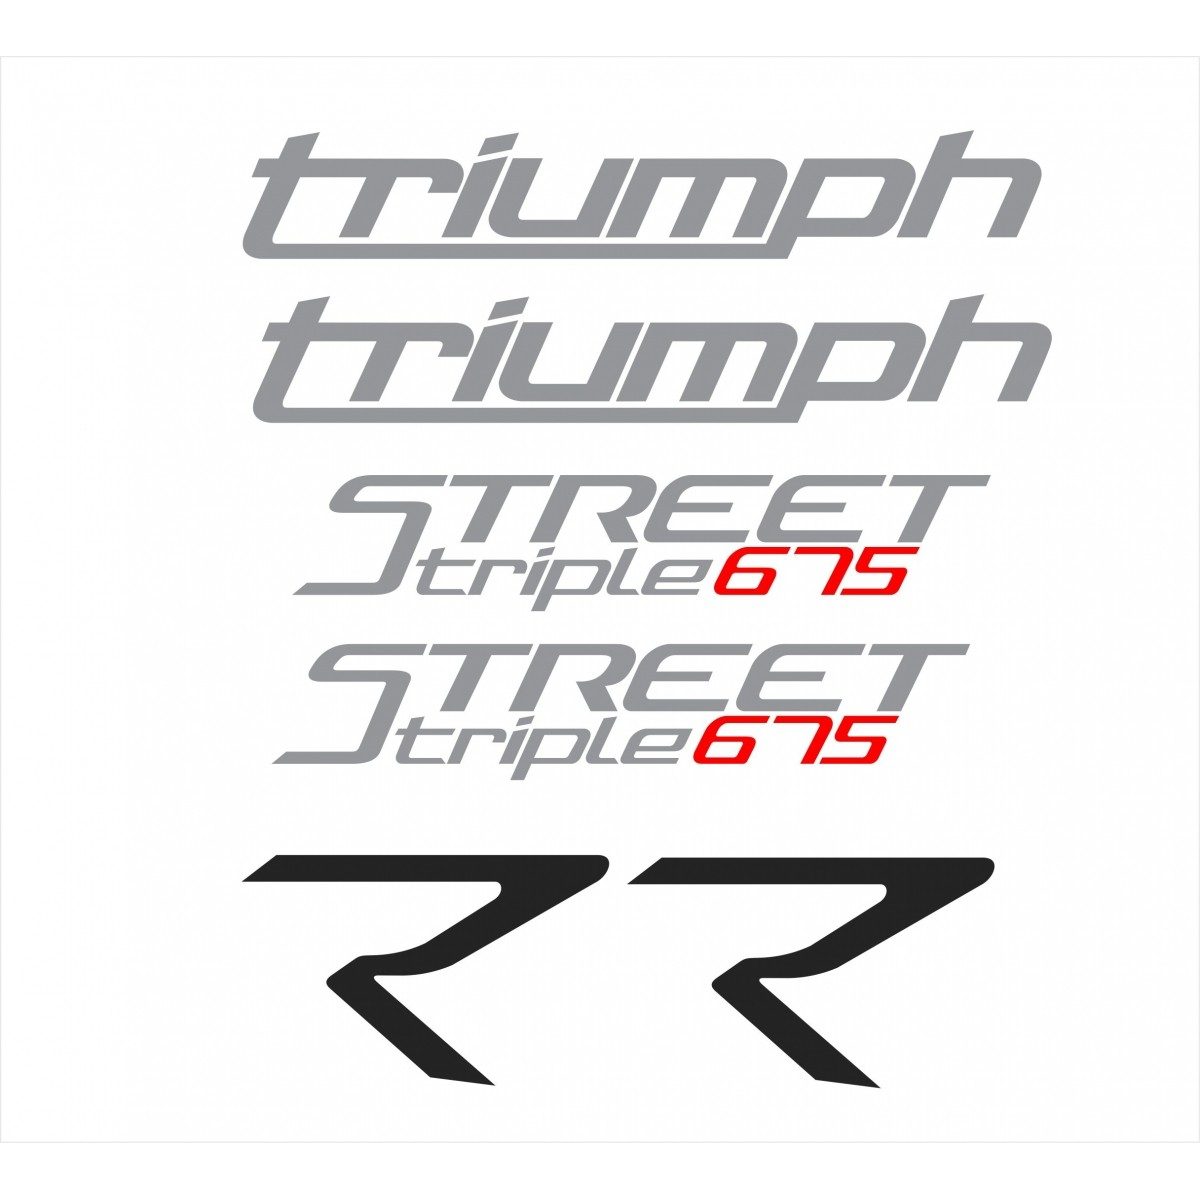 Kit Adesivos Triumph Speed Triple 675 R 2016 Preta St013